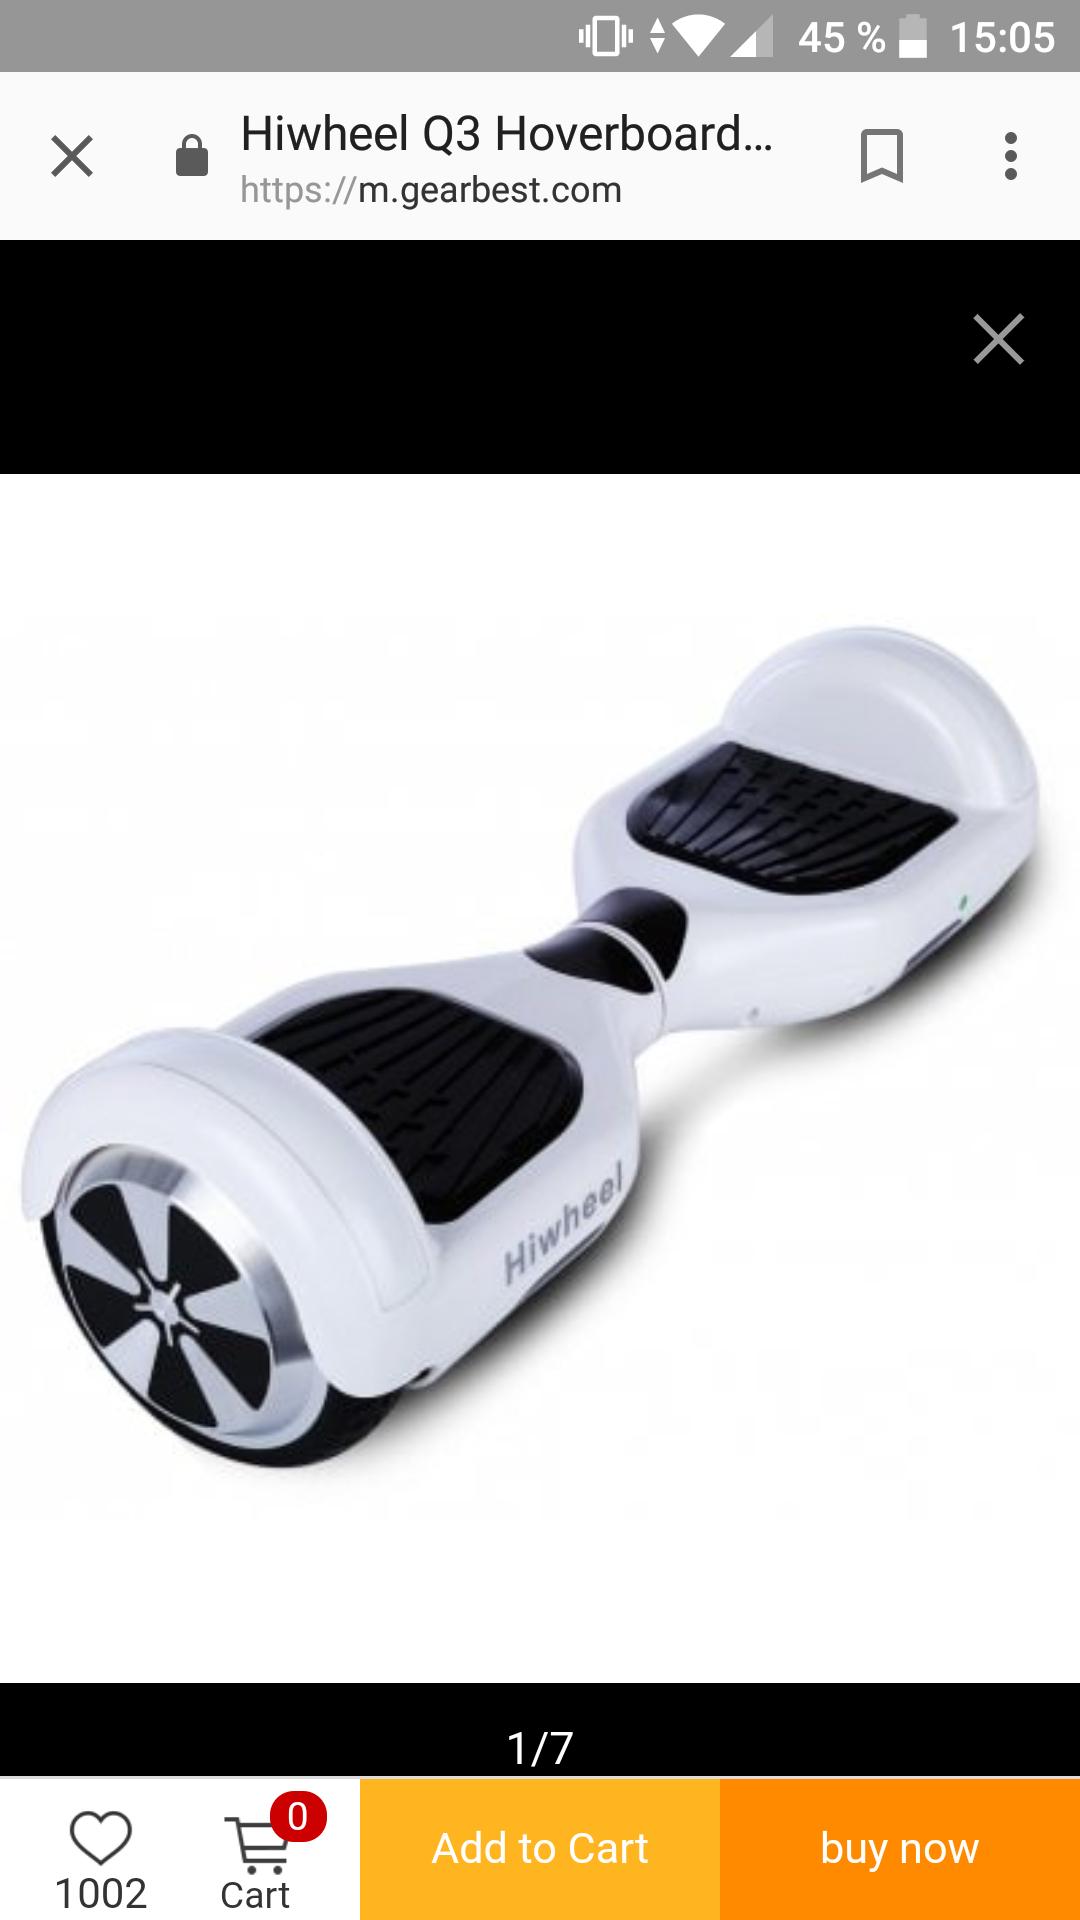 Hiwheel Q3 Hoverboard